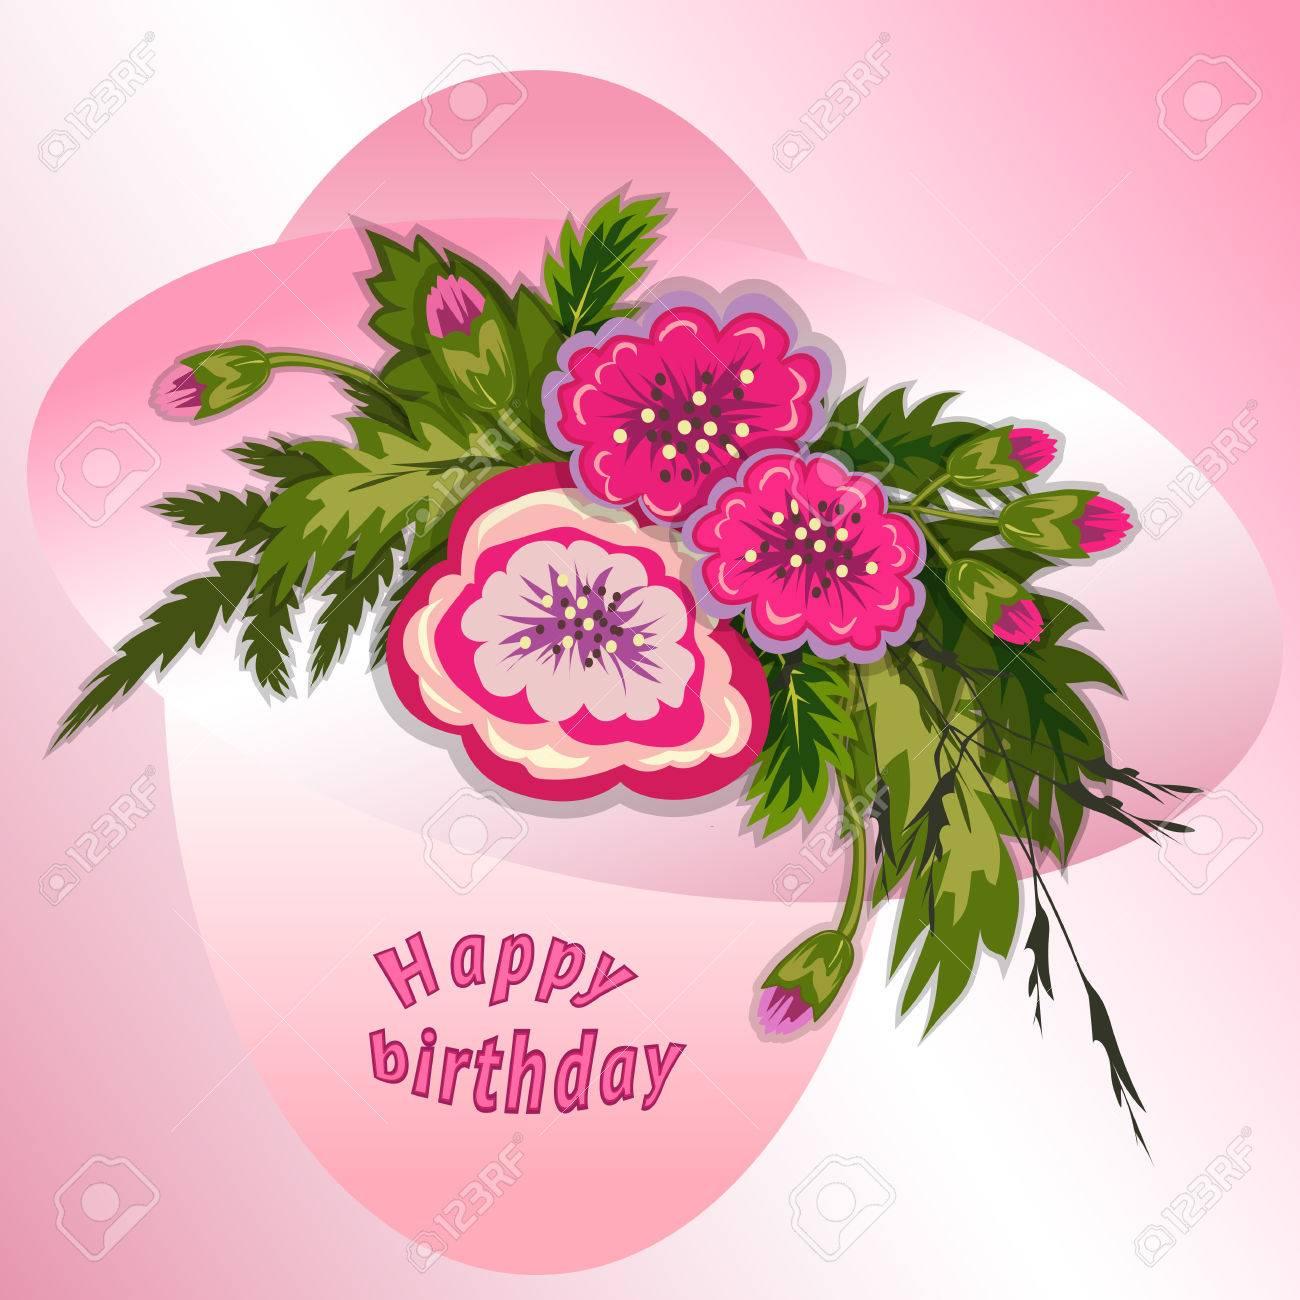 Composicion Floral Ramo De Flores De Color Rosa Sobre Fondo Rosa